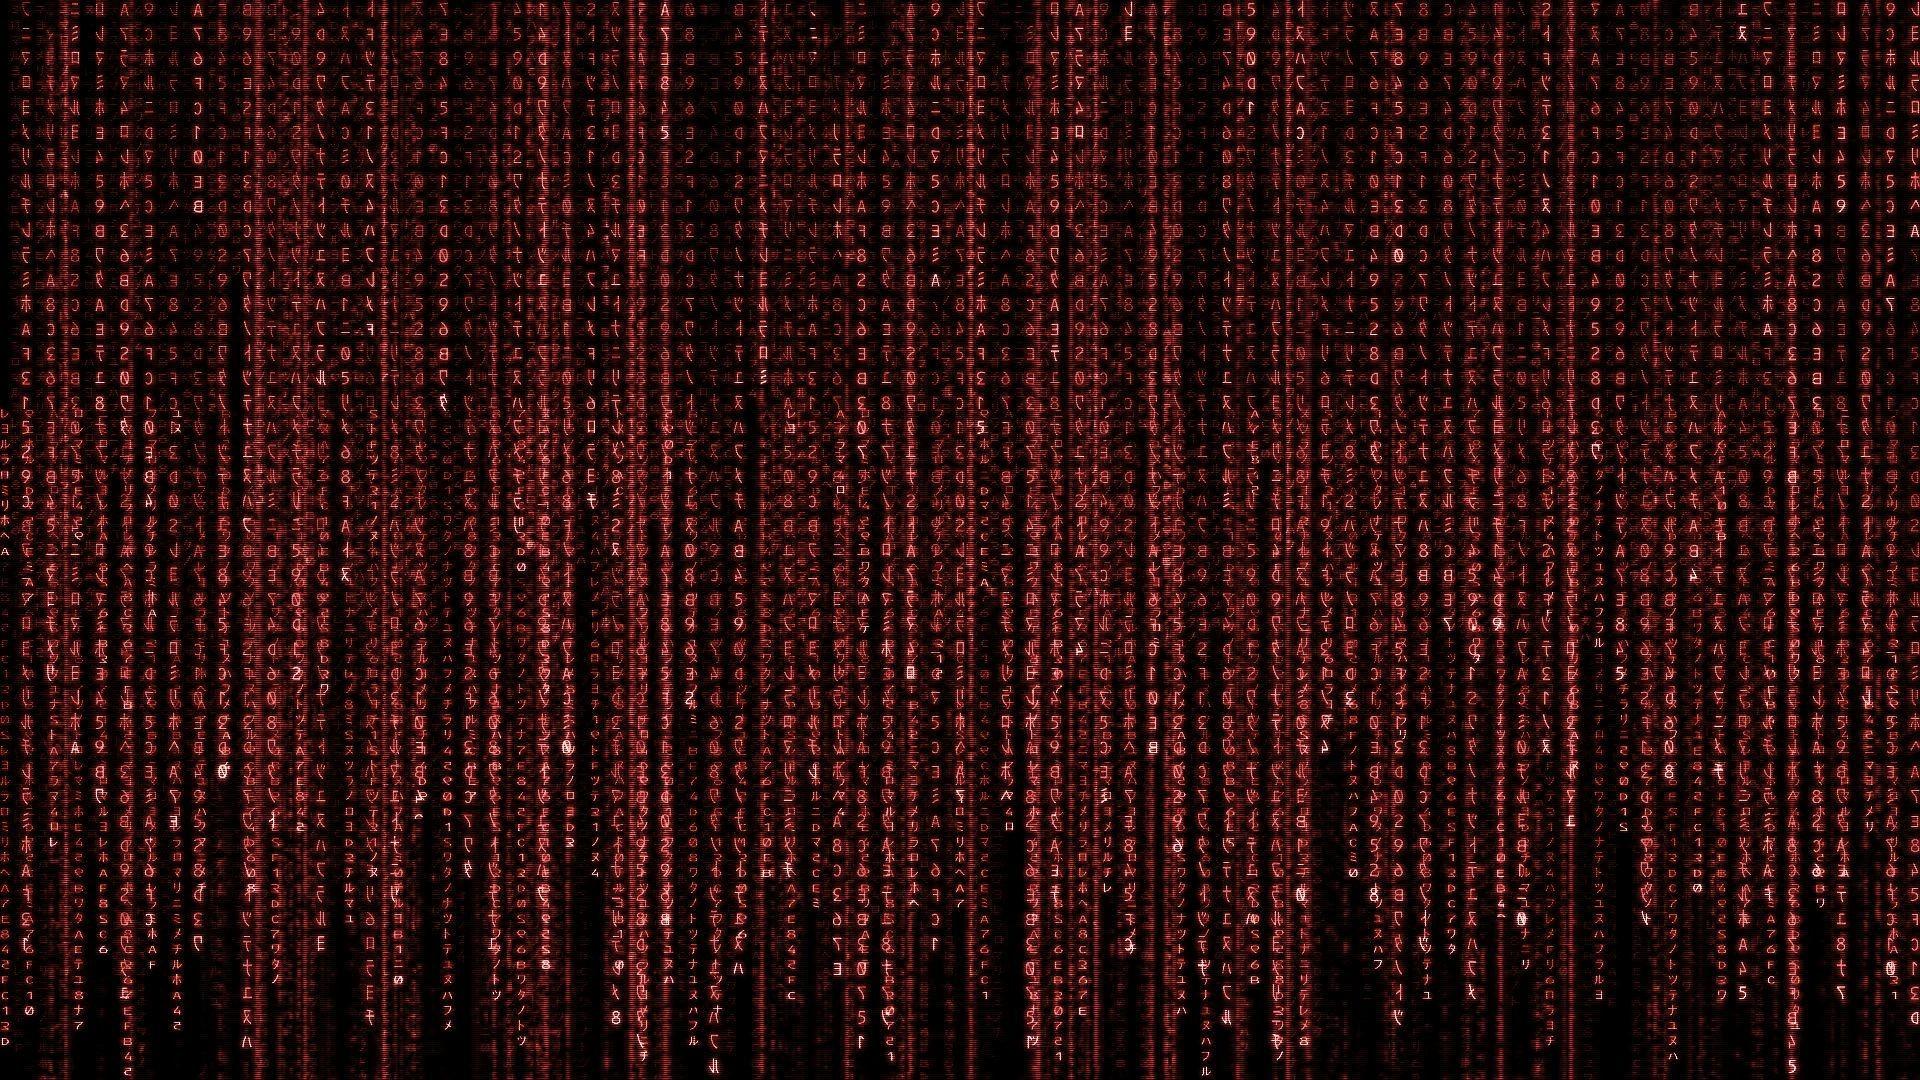 hd wallpaper wallpapers blue matrix binary code hd widescreen